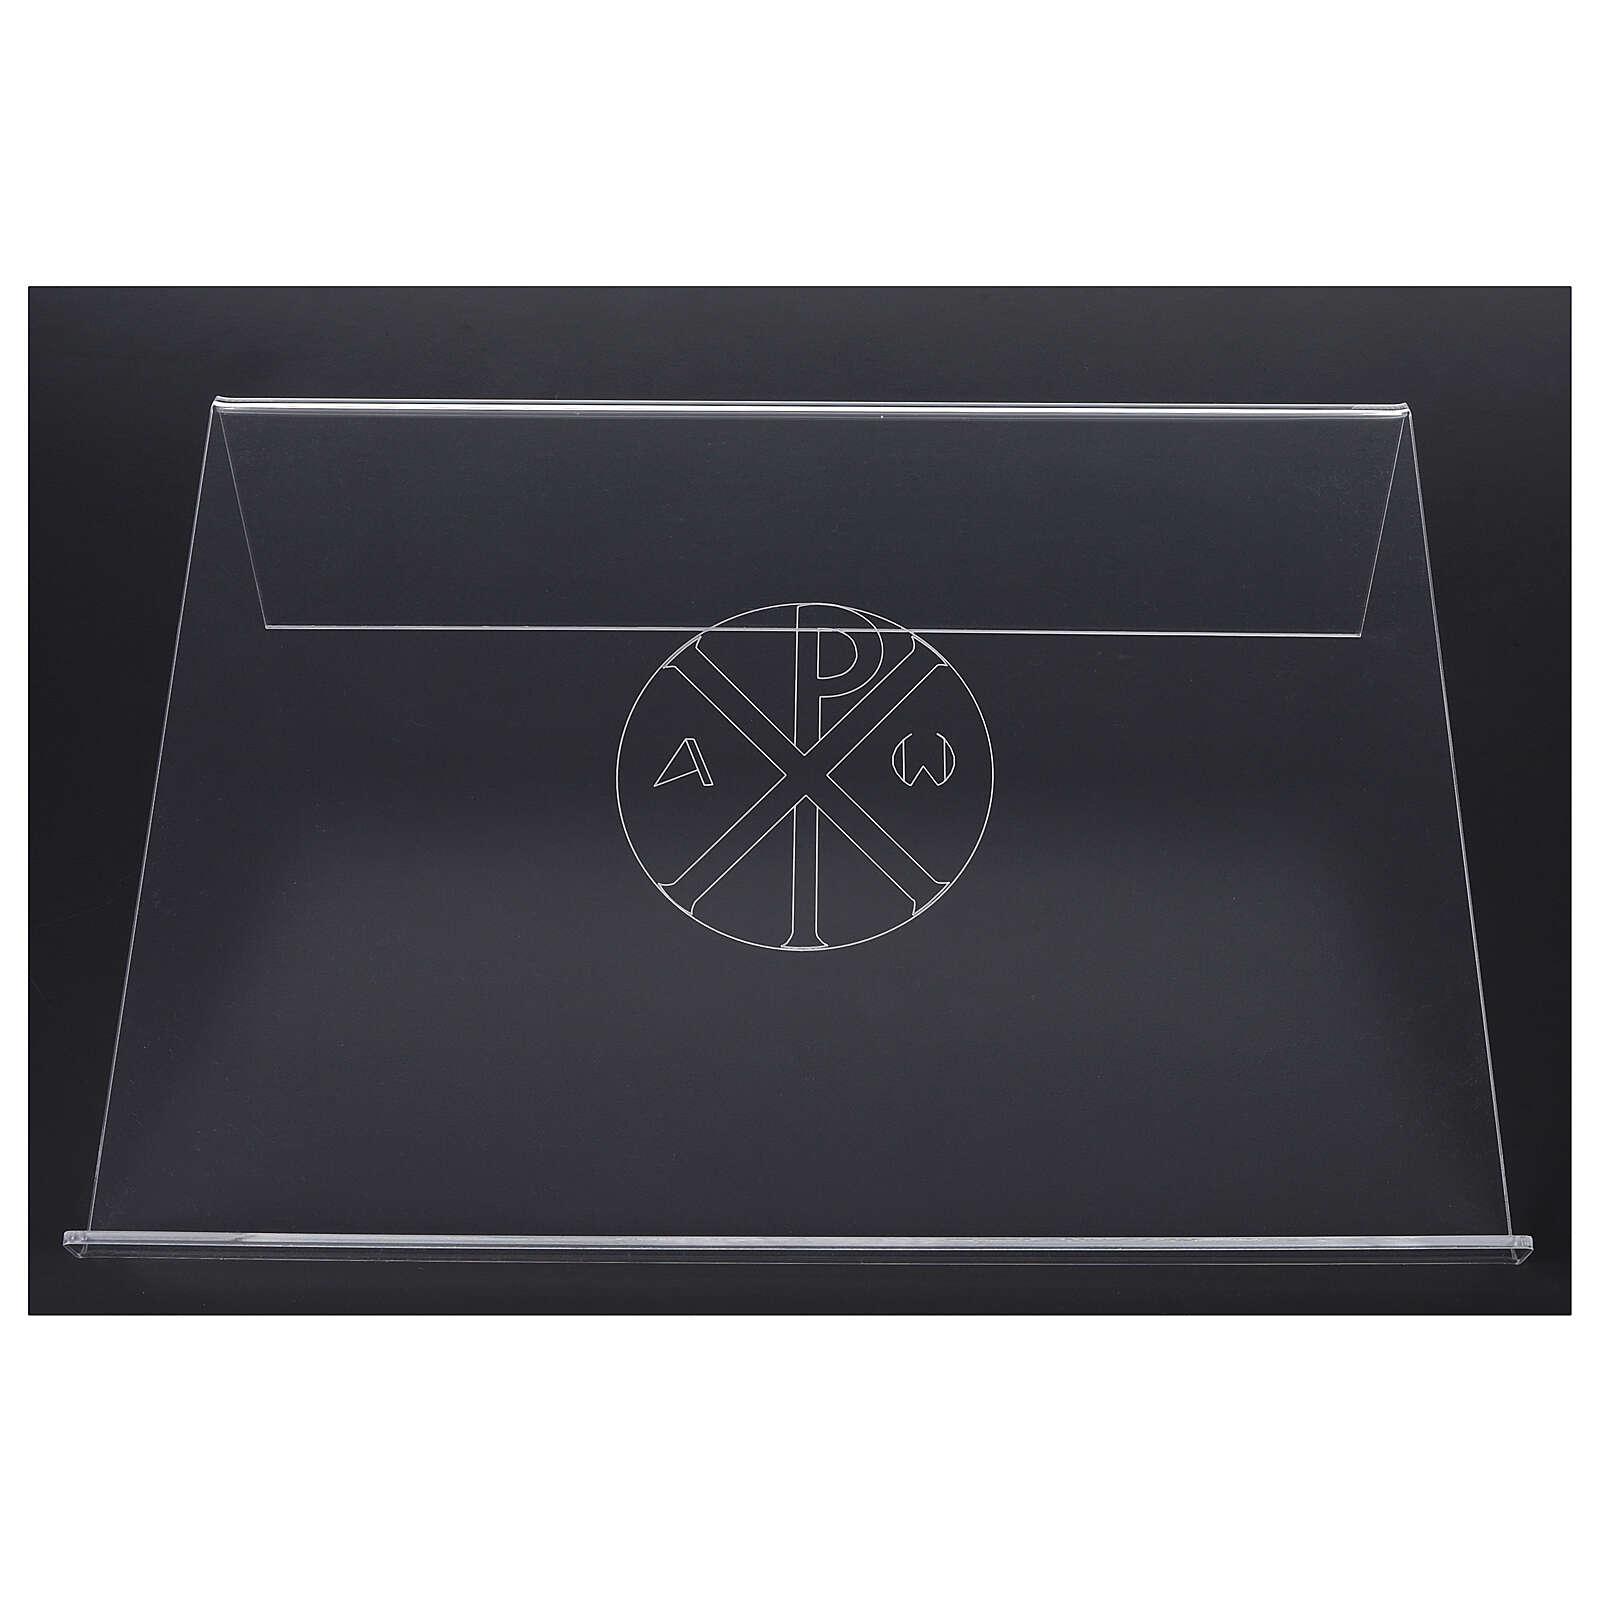 Pupitre plexiglas avec gravure Chi-Rho 45x30cm 4